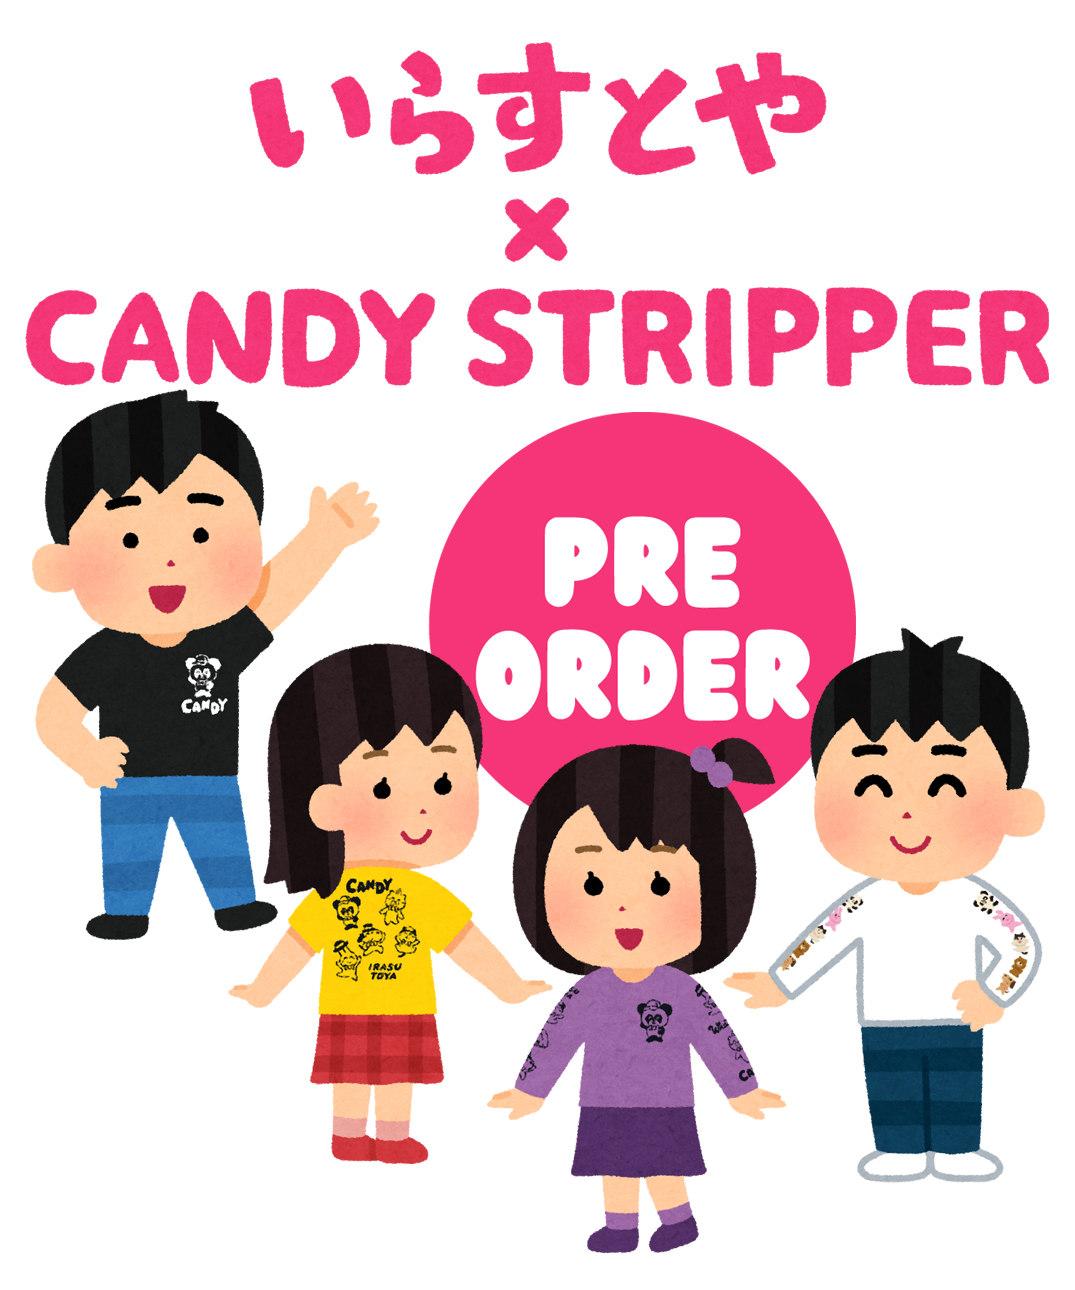 Candy Stripper(キャンディストリッパー )のショップニュース「【いらすとや×Candy Stripper】コラボアイテム先行予約会スタート!」